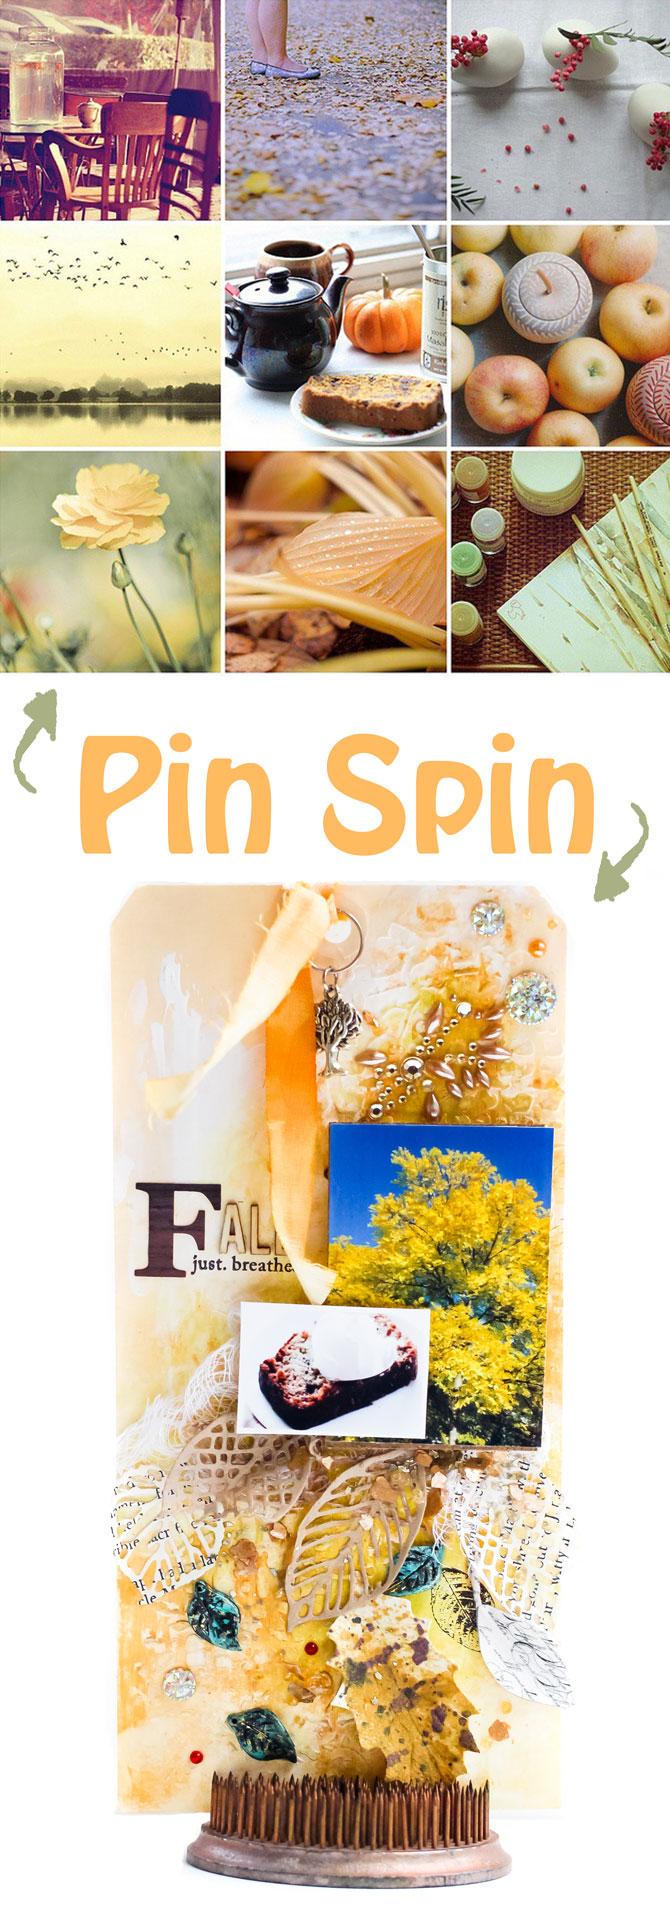 Oct-29-pinspin-wendy